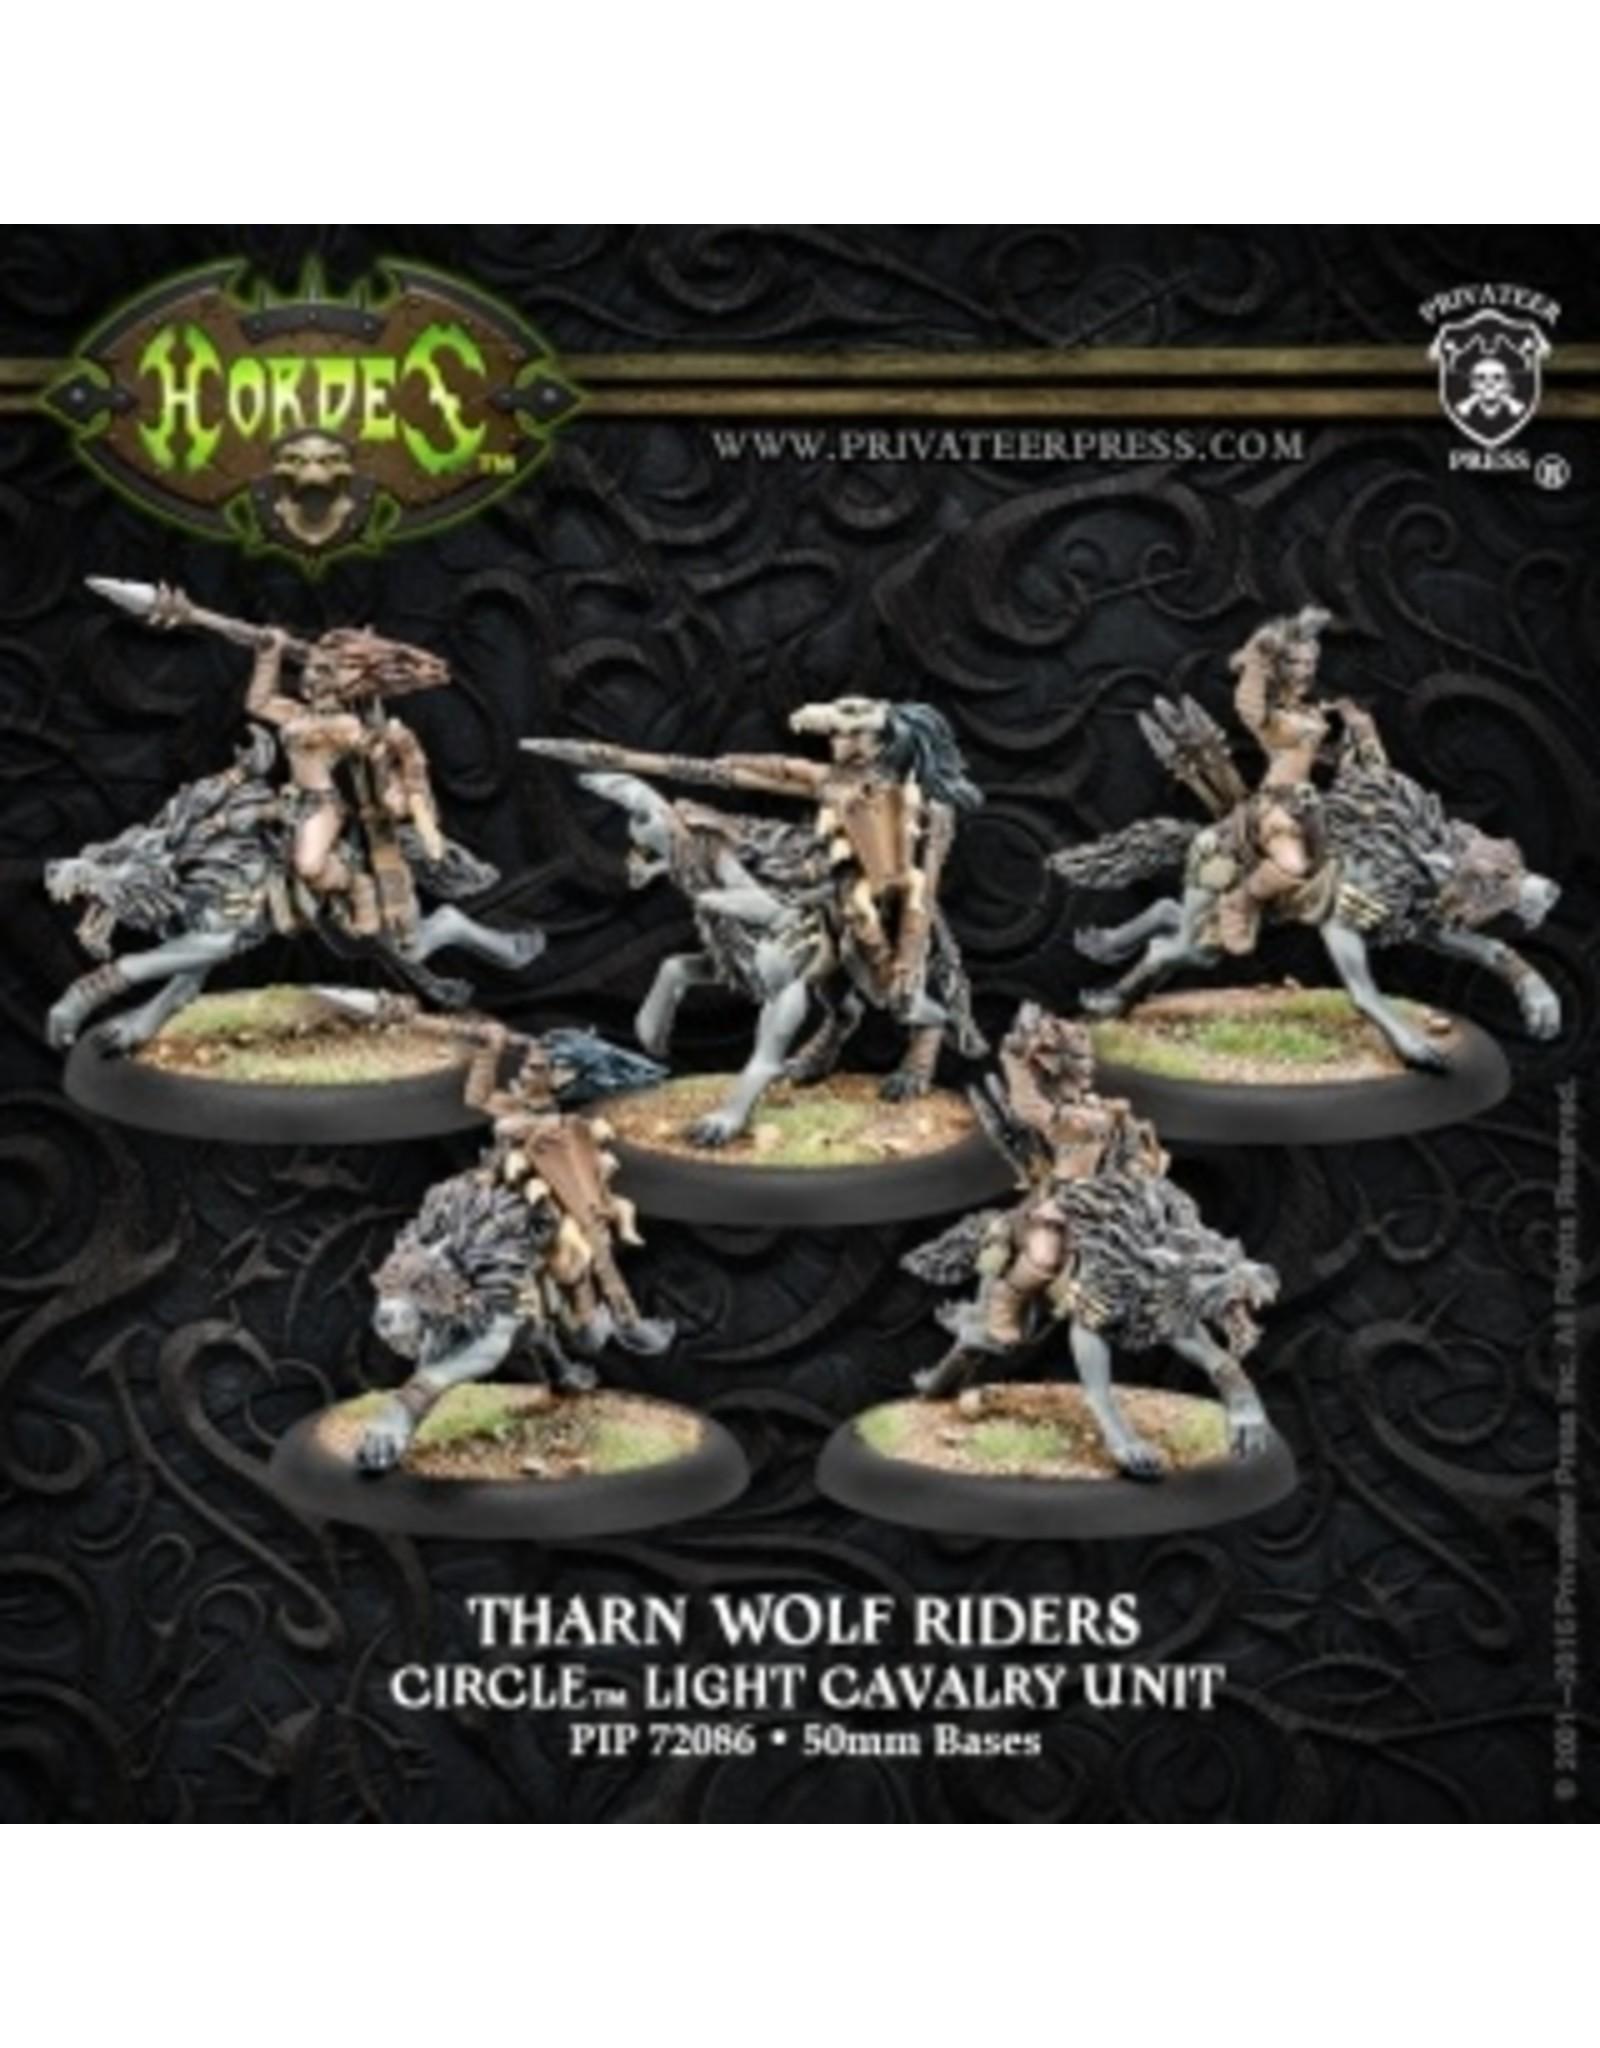 Hordes: Circle Orboros Tharn Wolf Riders Light Cavalry Unit (1) (White Metal)